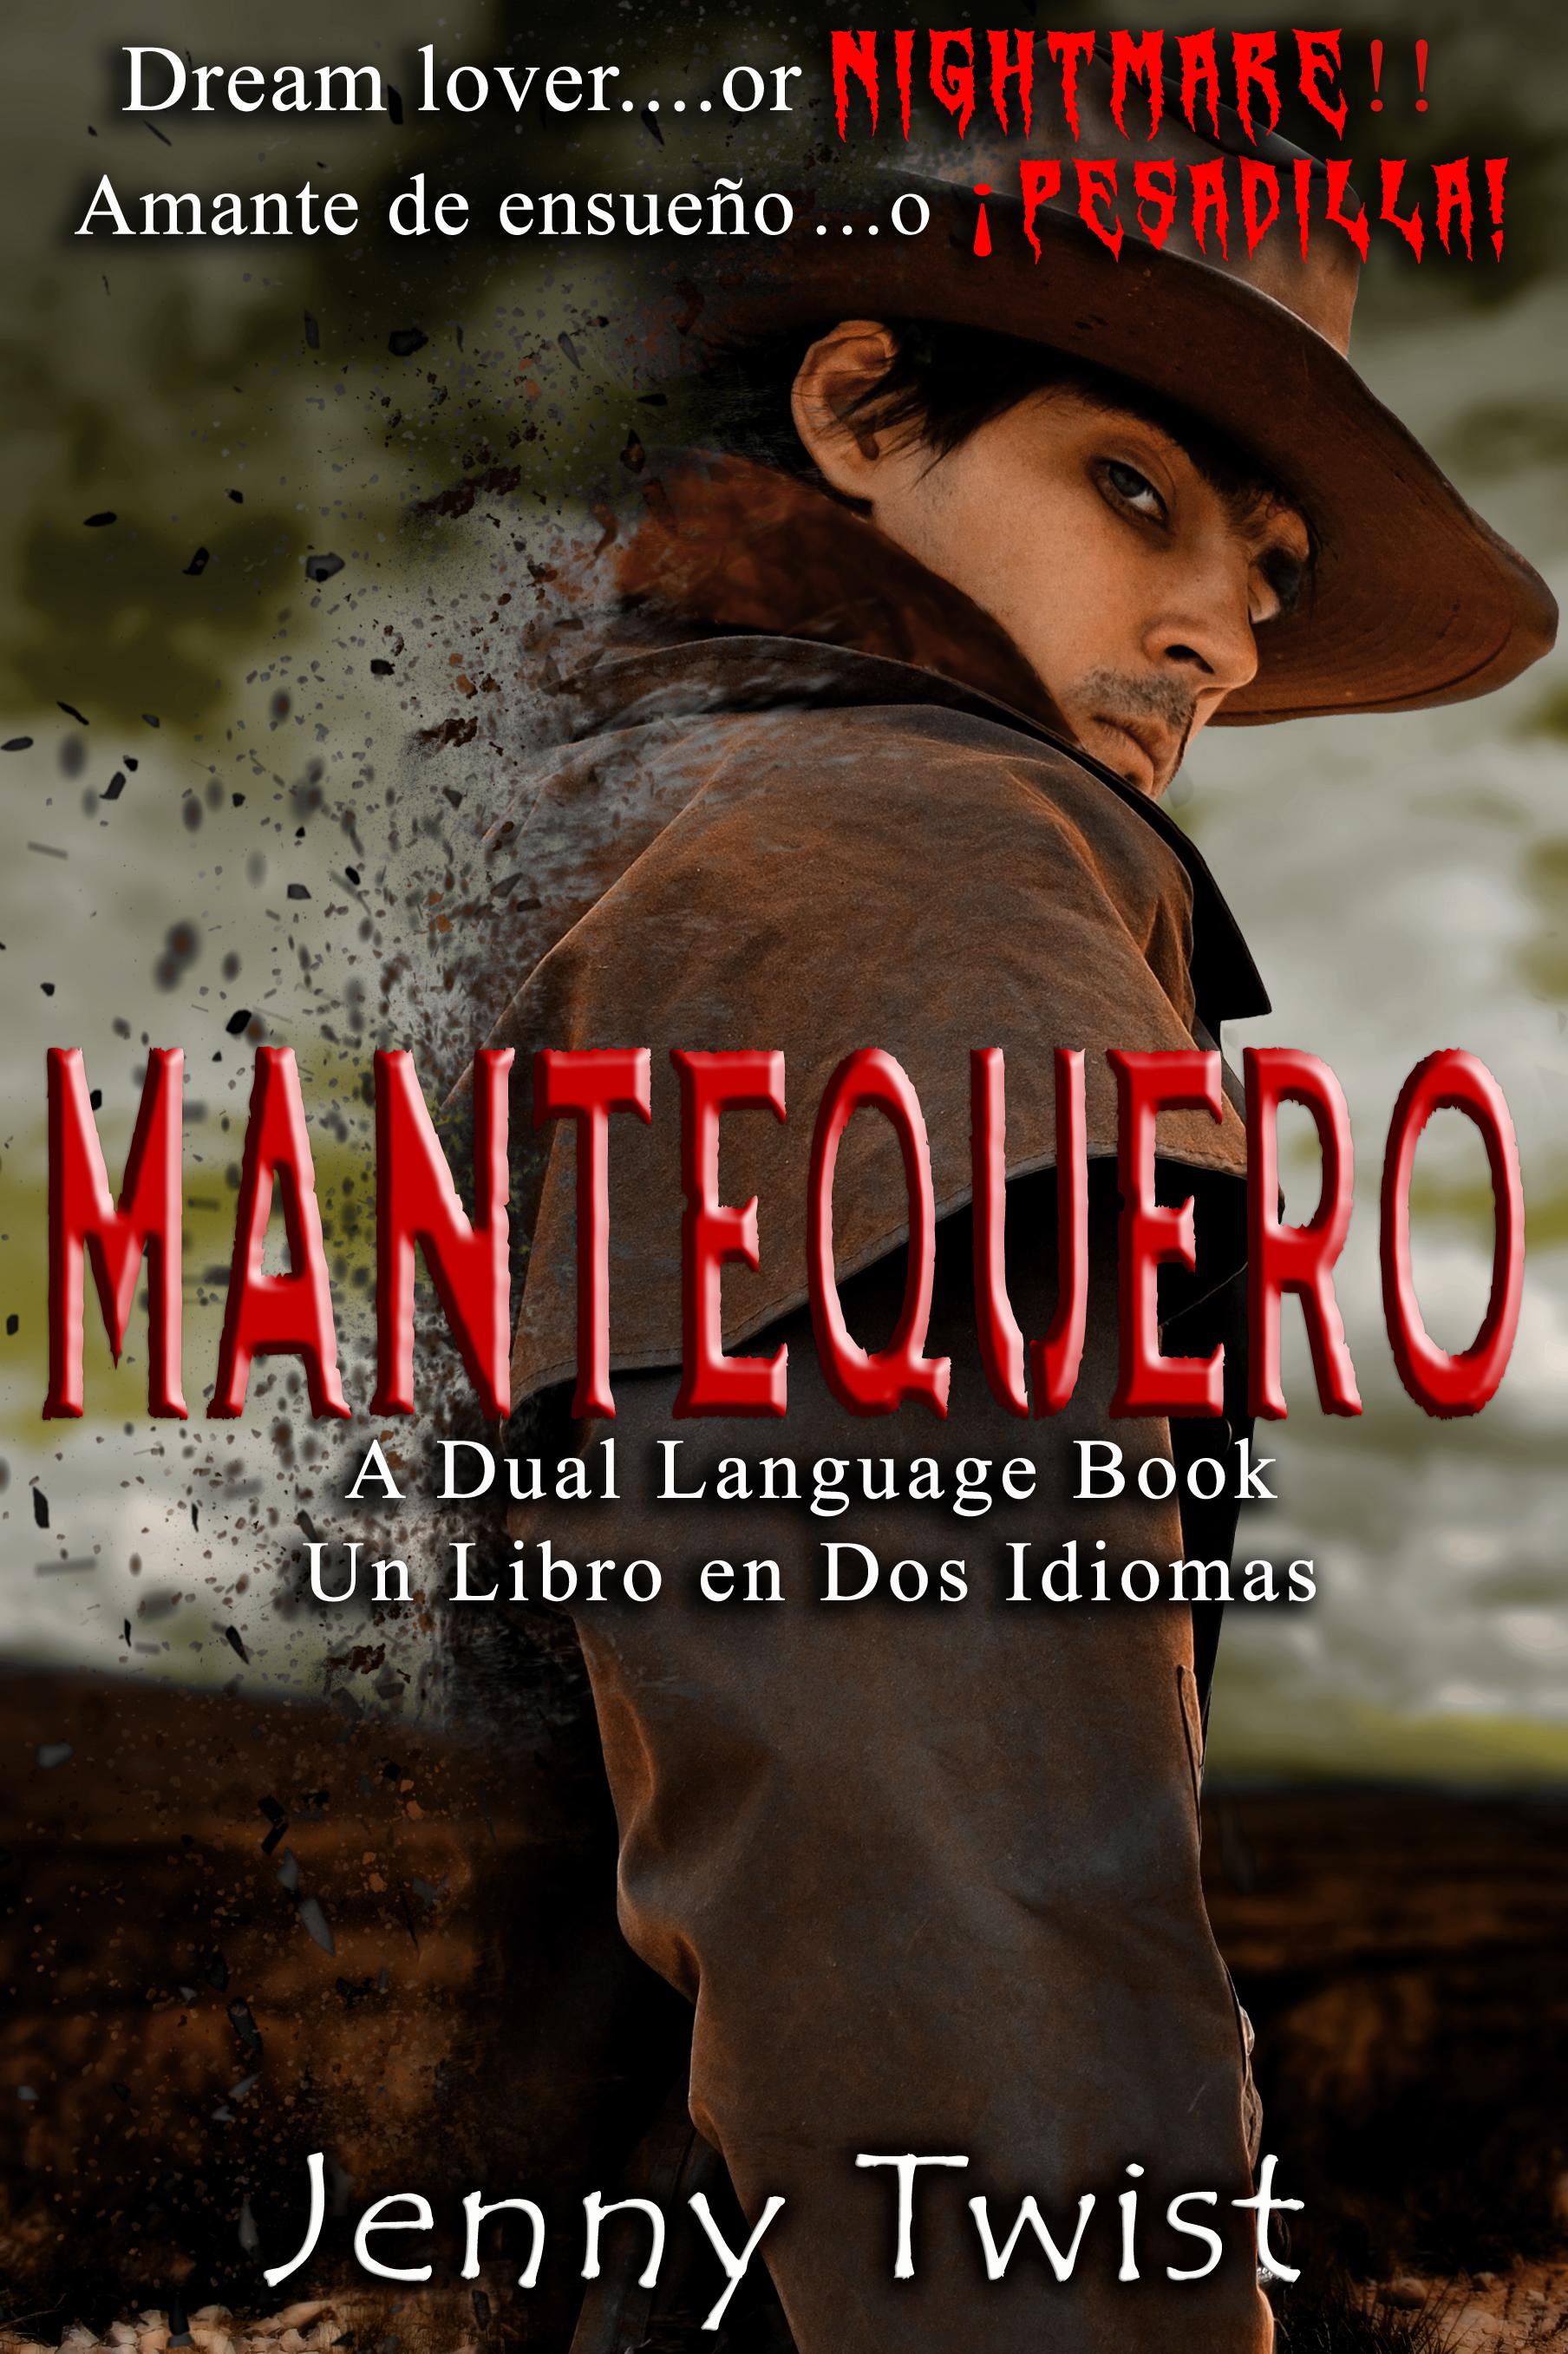 Mantequero - Dual Language Book: English/Spanish  by  Jenny Twist